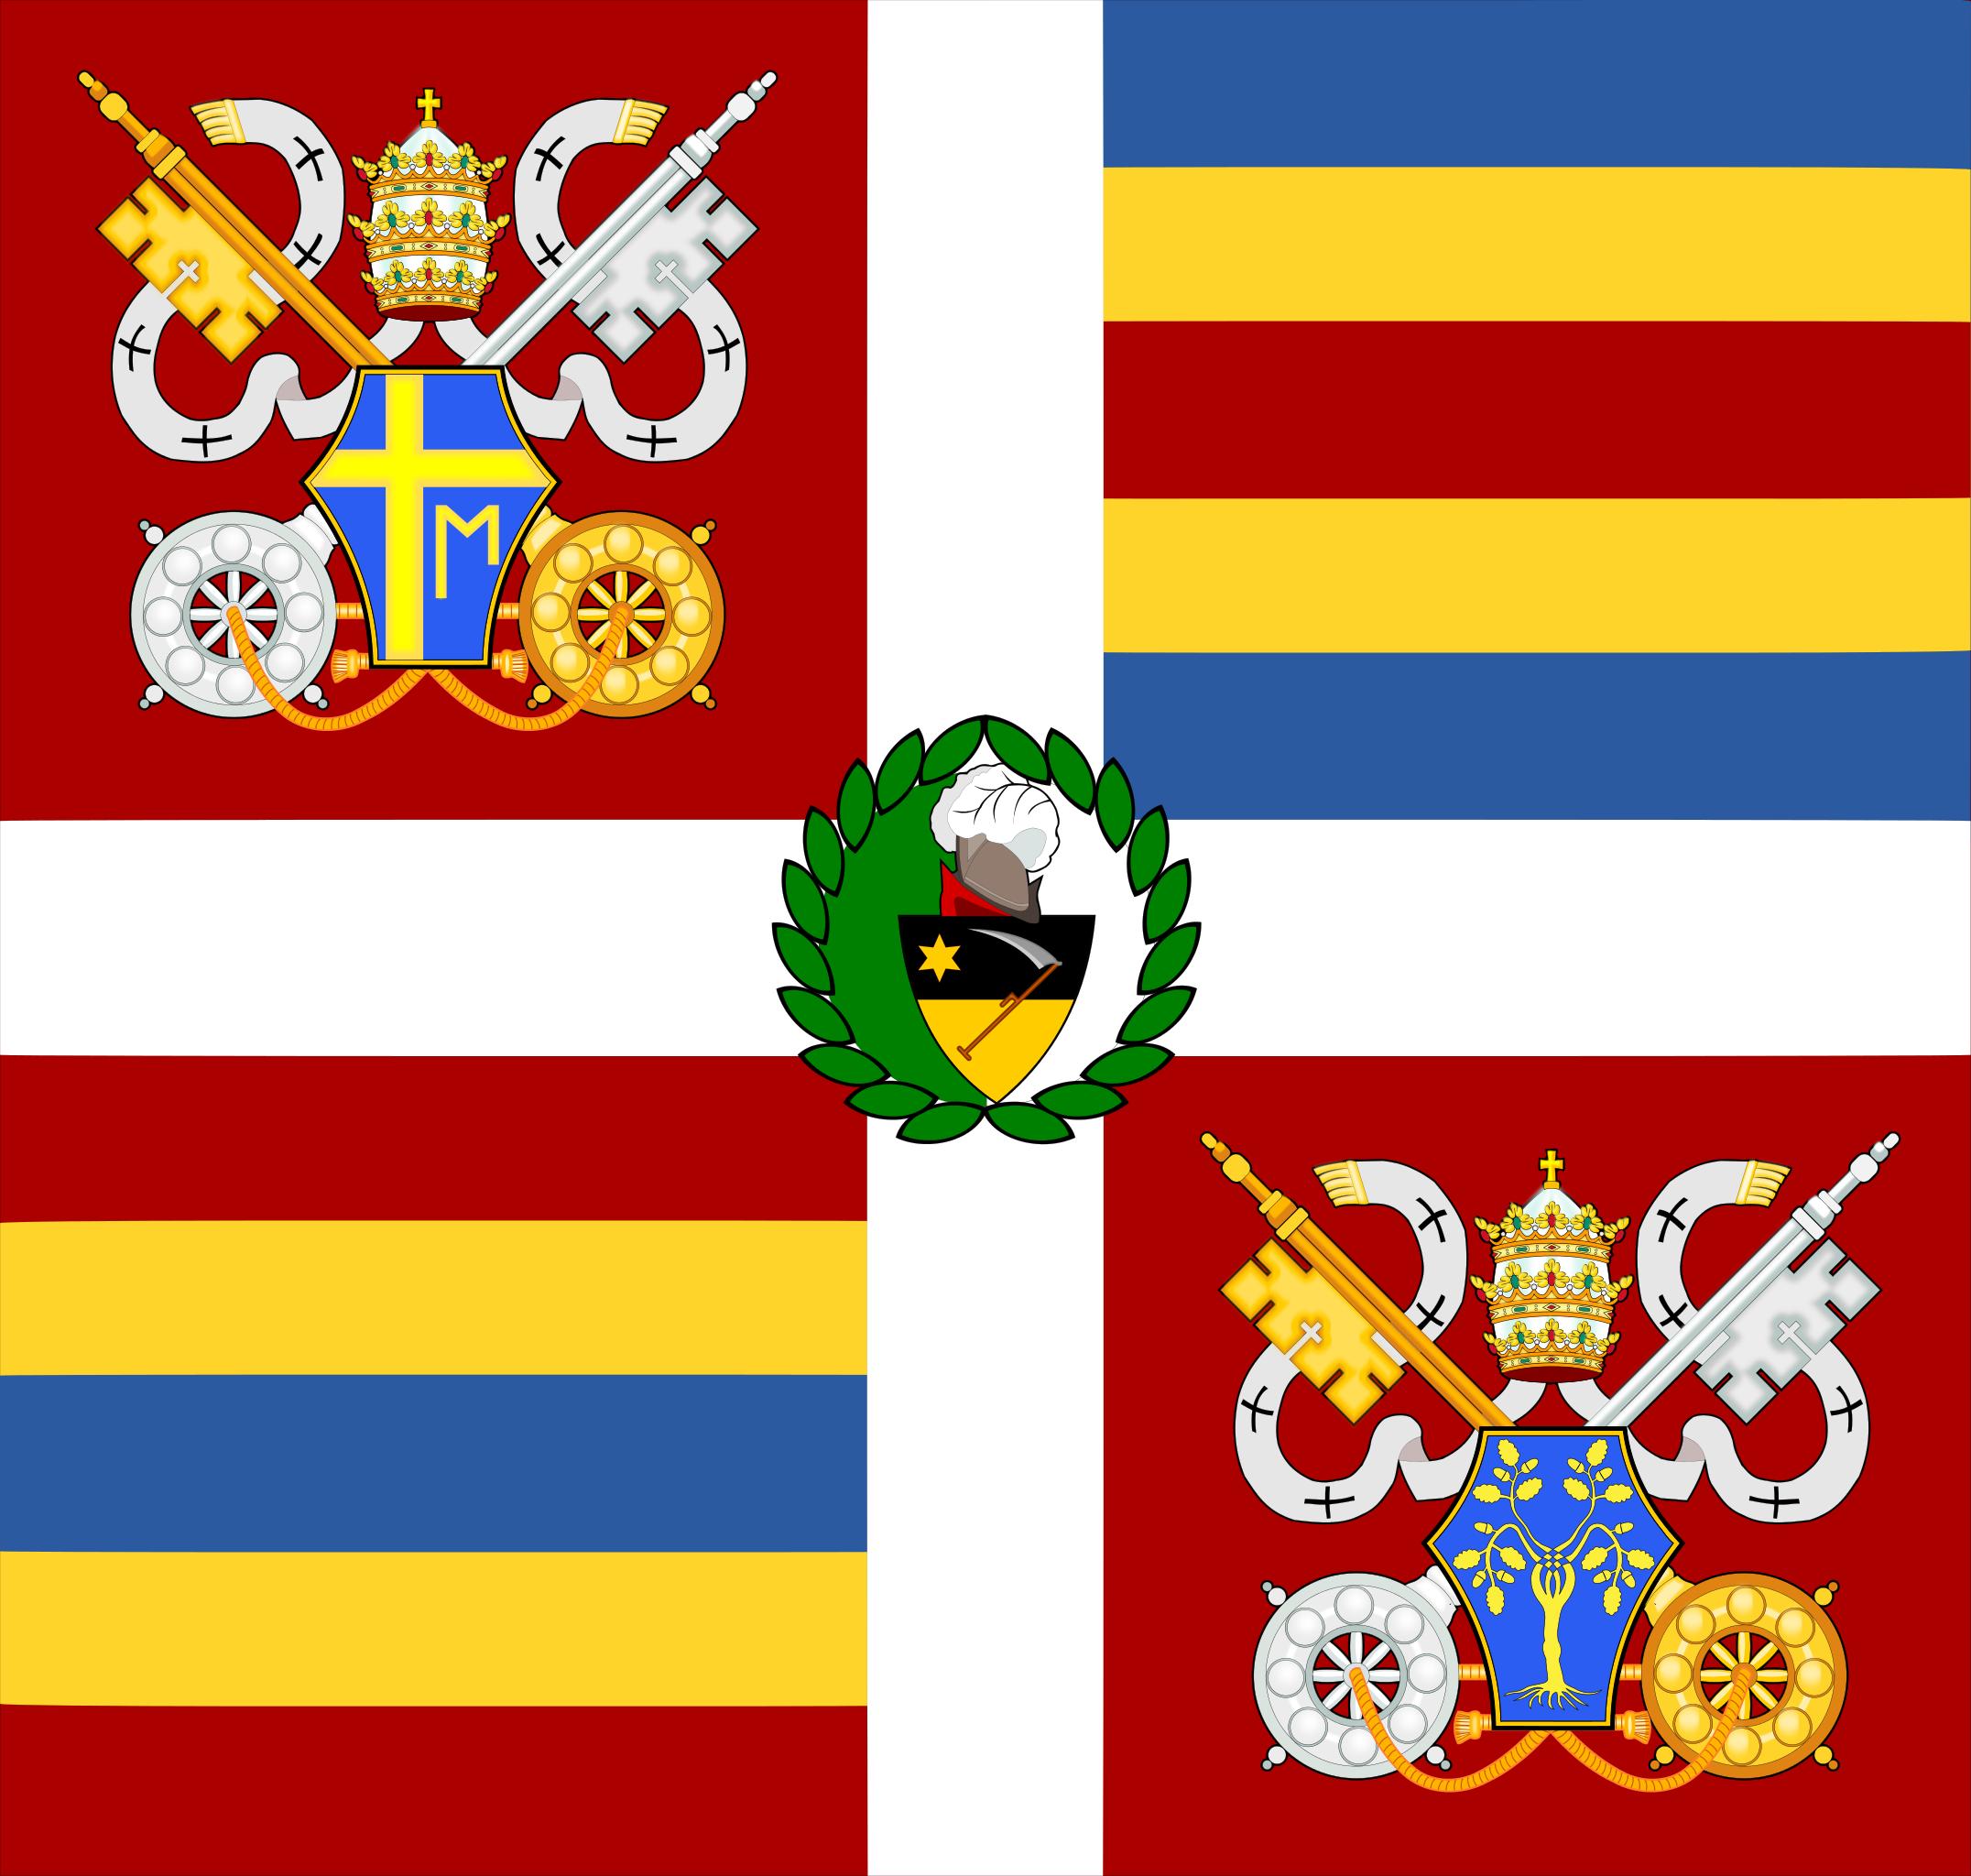 The banner of the Swiss Guard under Pope John Paul II and commander Elmar Mäder (2002–2005)